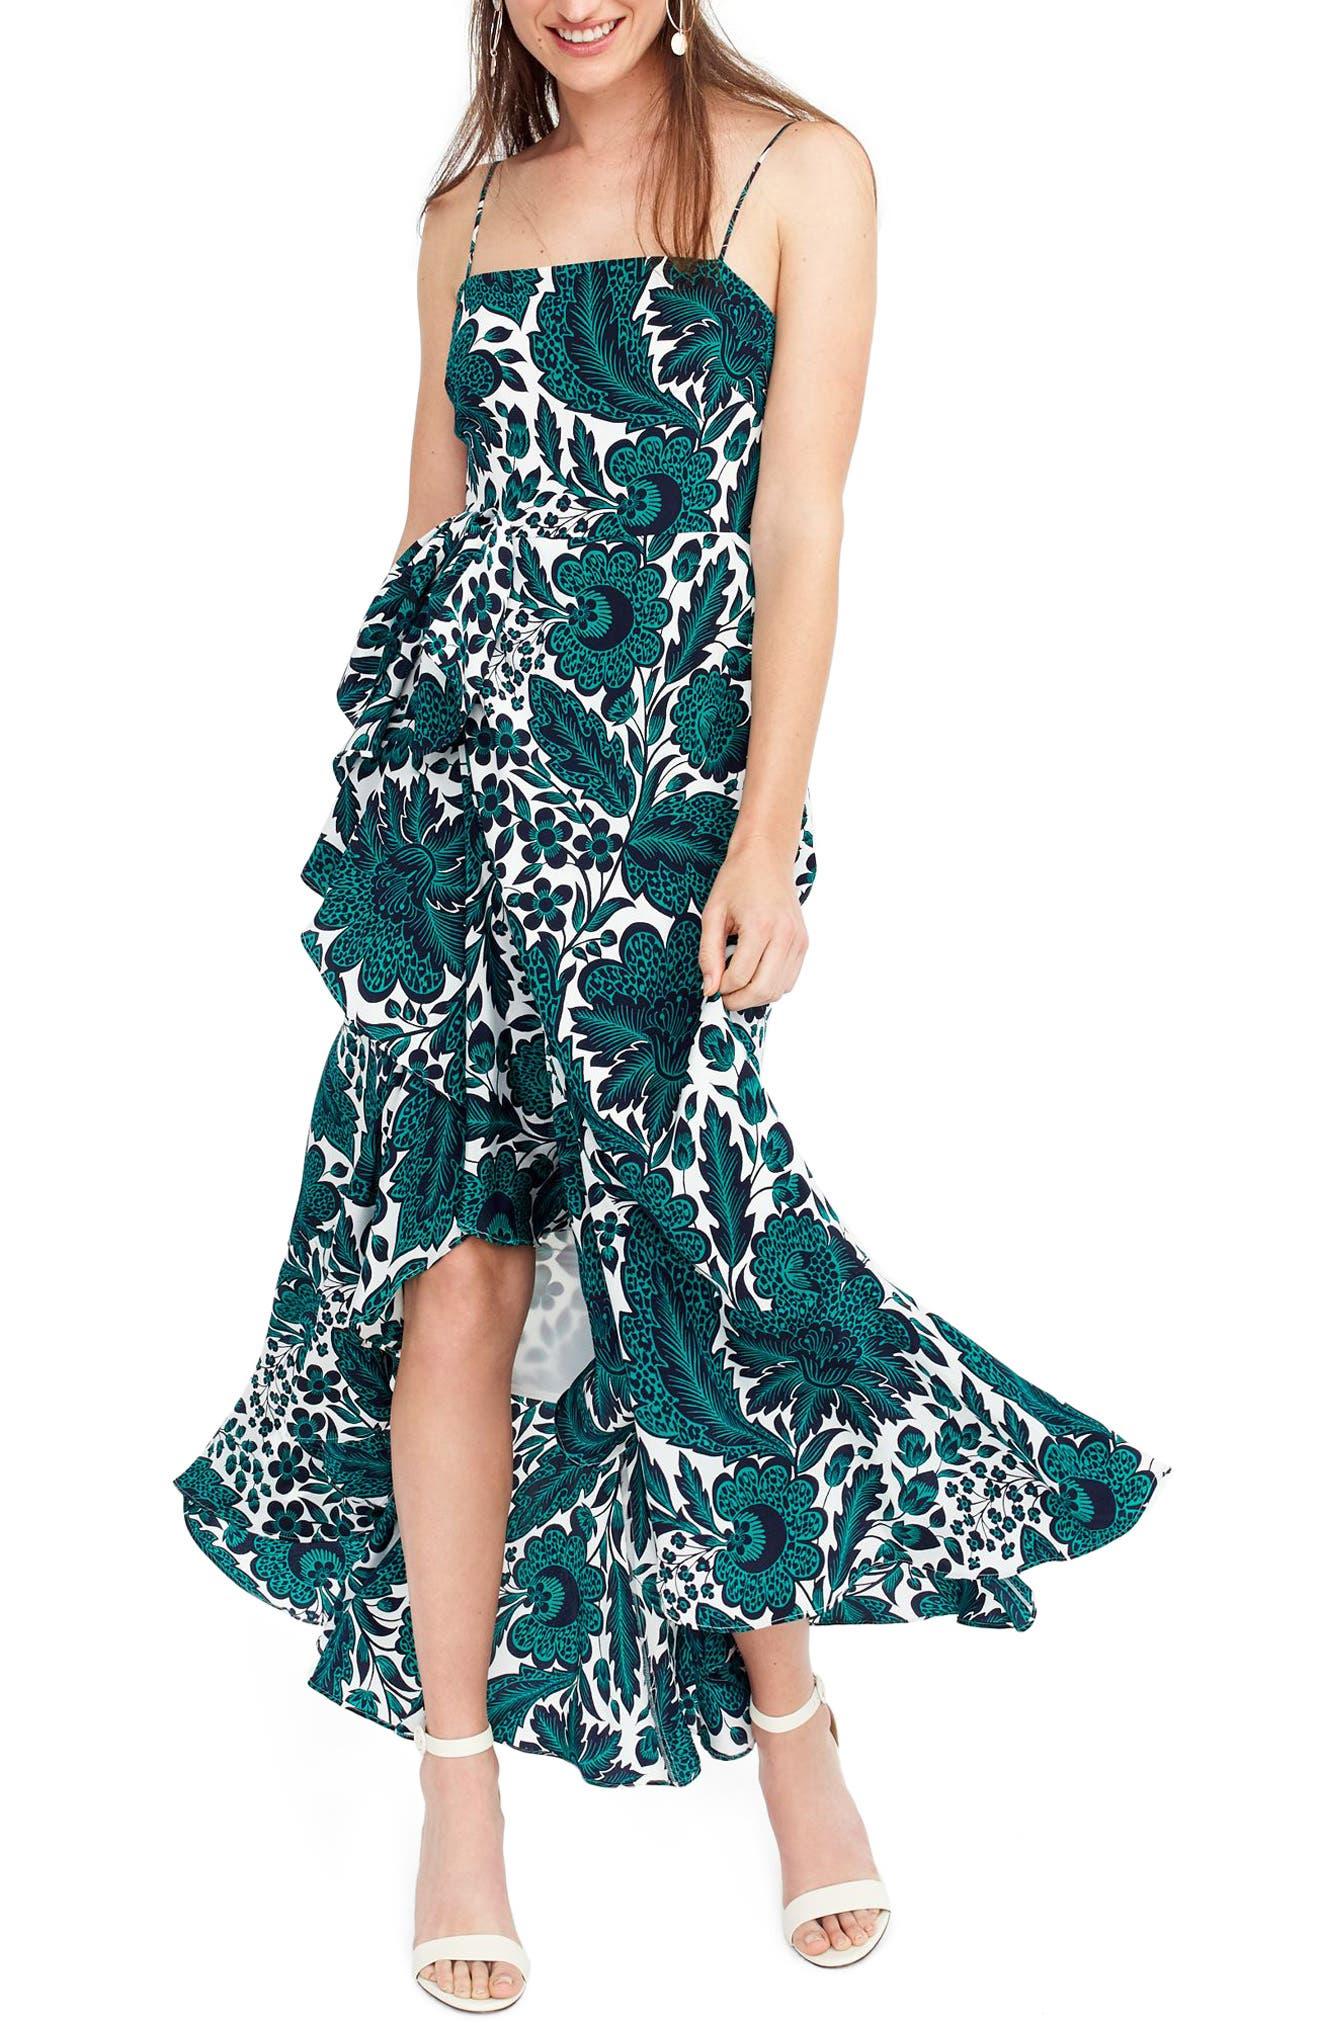 J.Crew Ruffle High/Low Silk Dress,                         Main,                         color, Navy Green